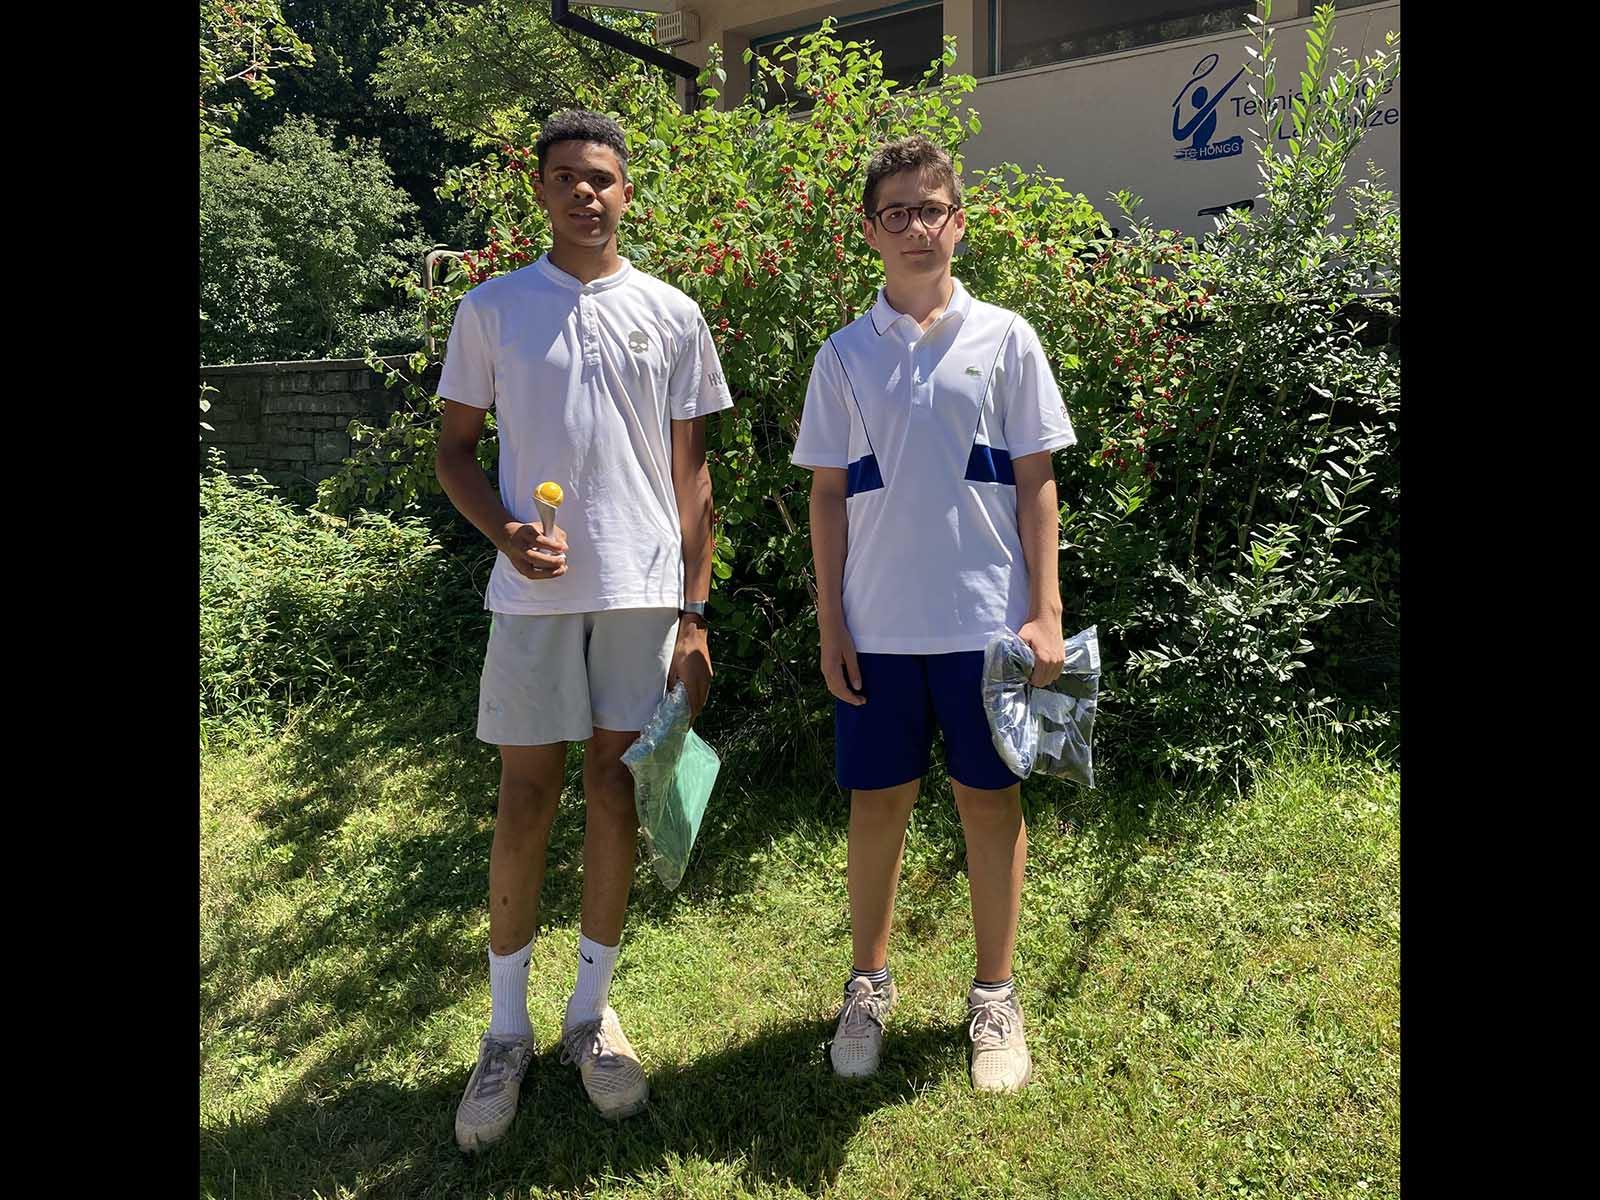 links - Hellani Alihedi, rechts - Schlienger Quentin